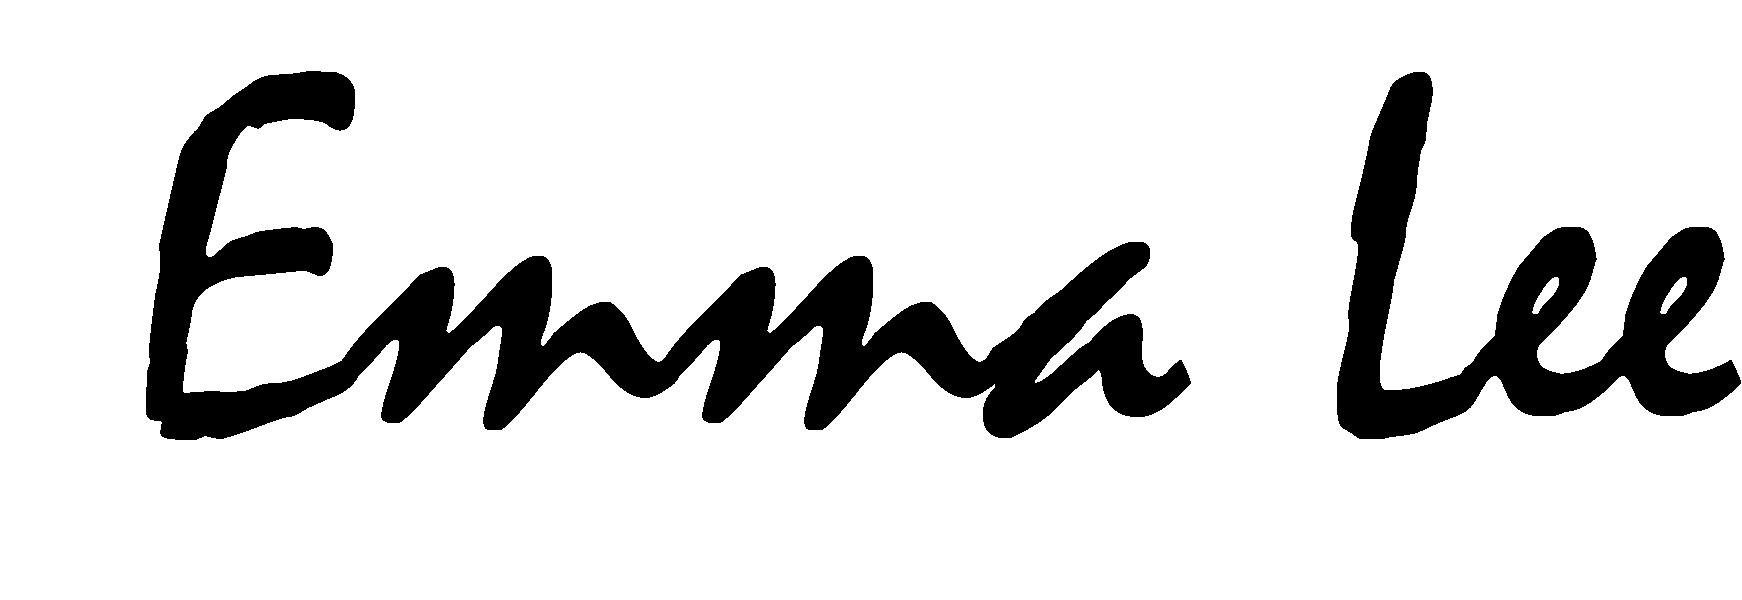 EMMA LEE's Signature